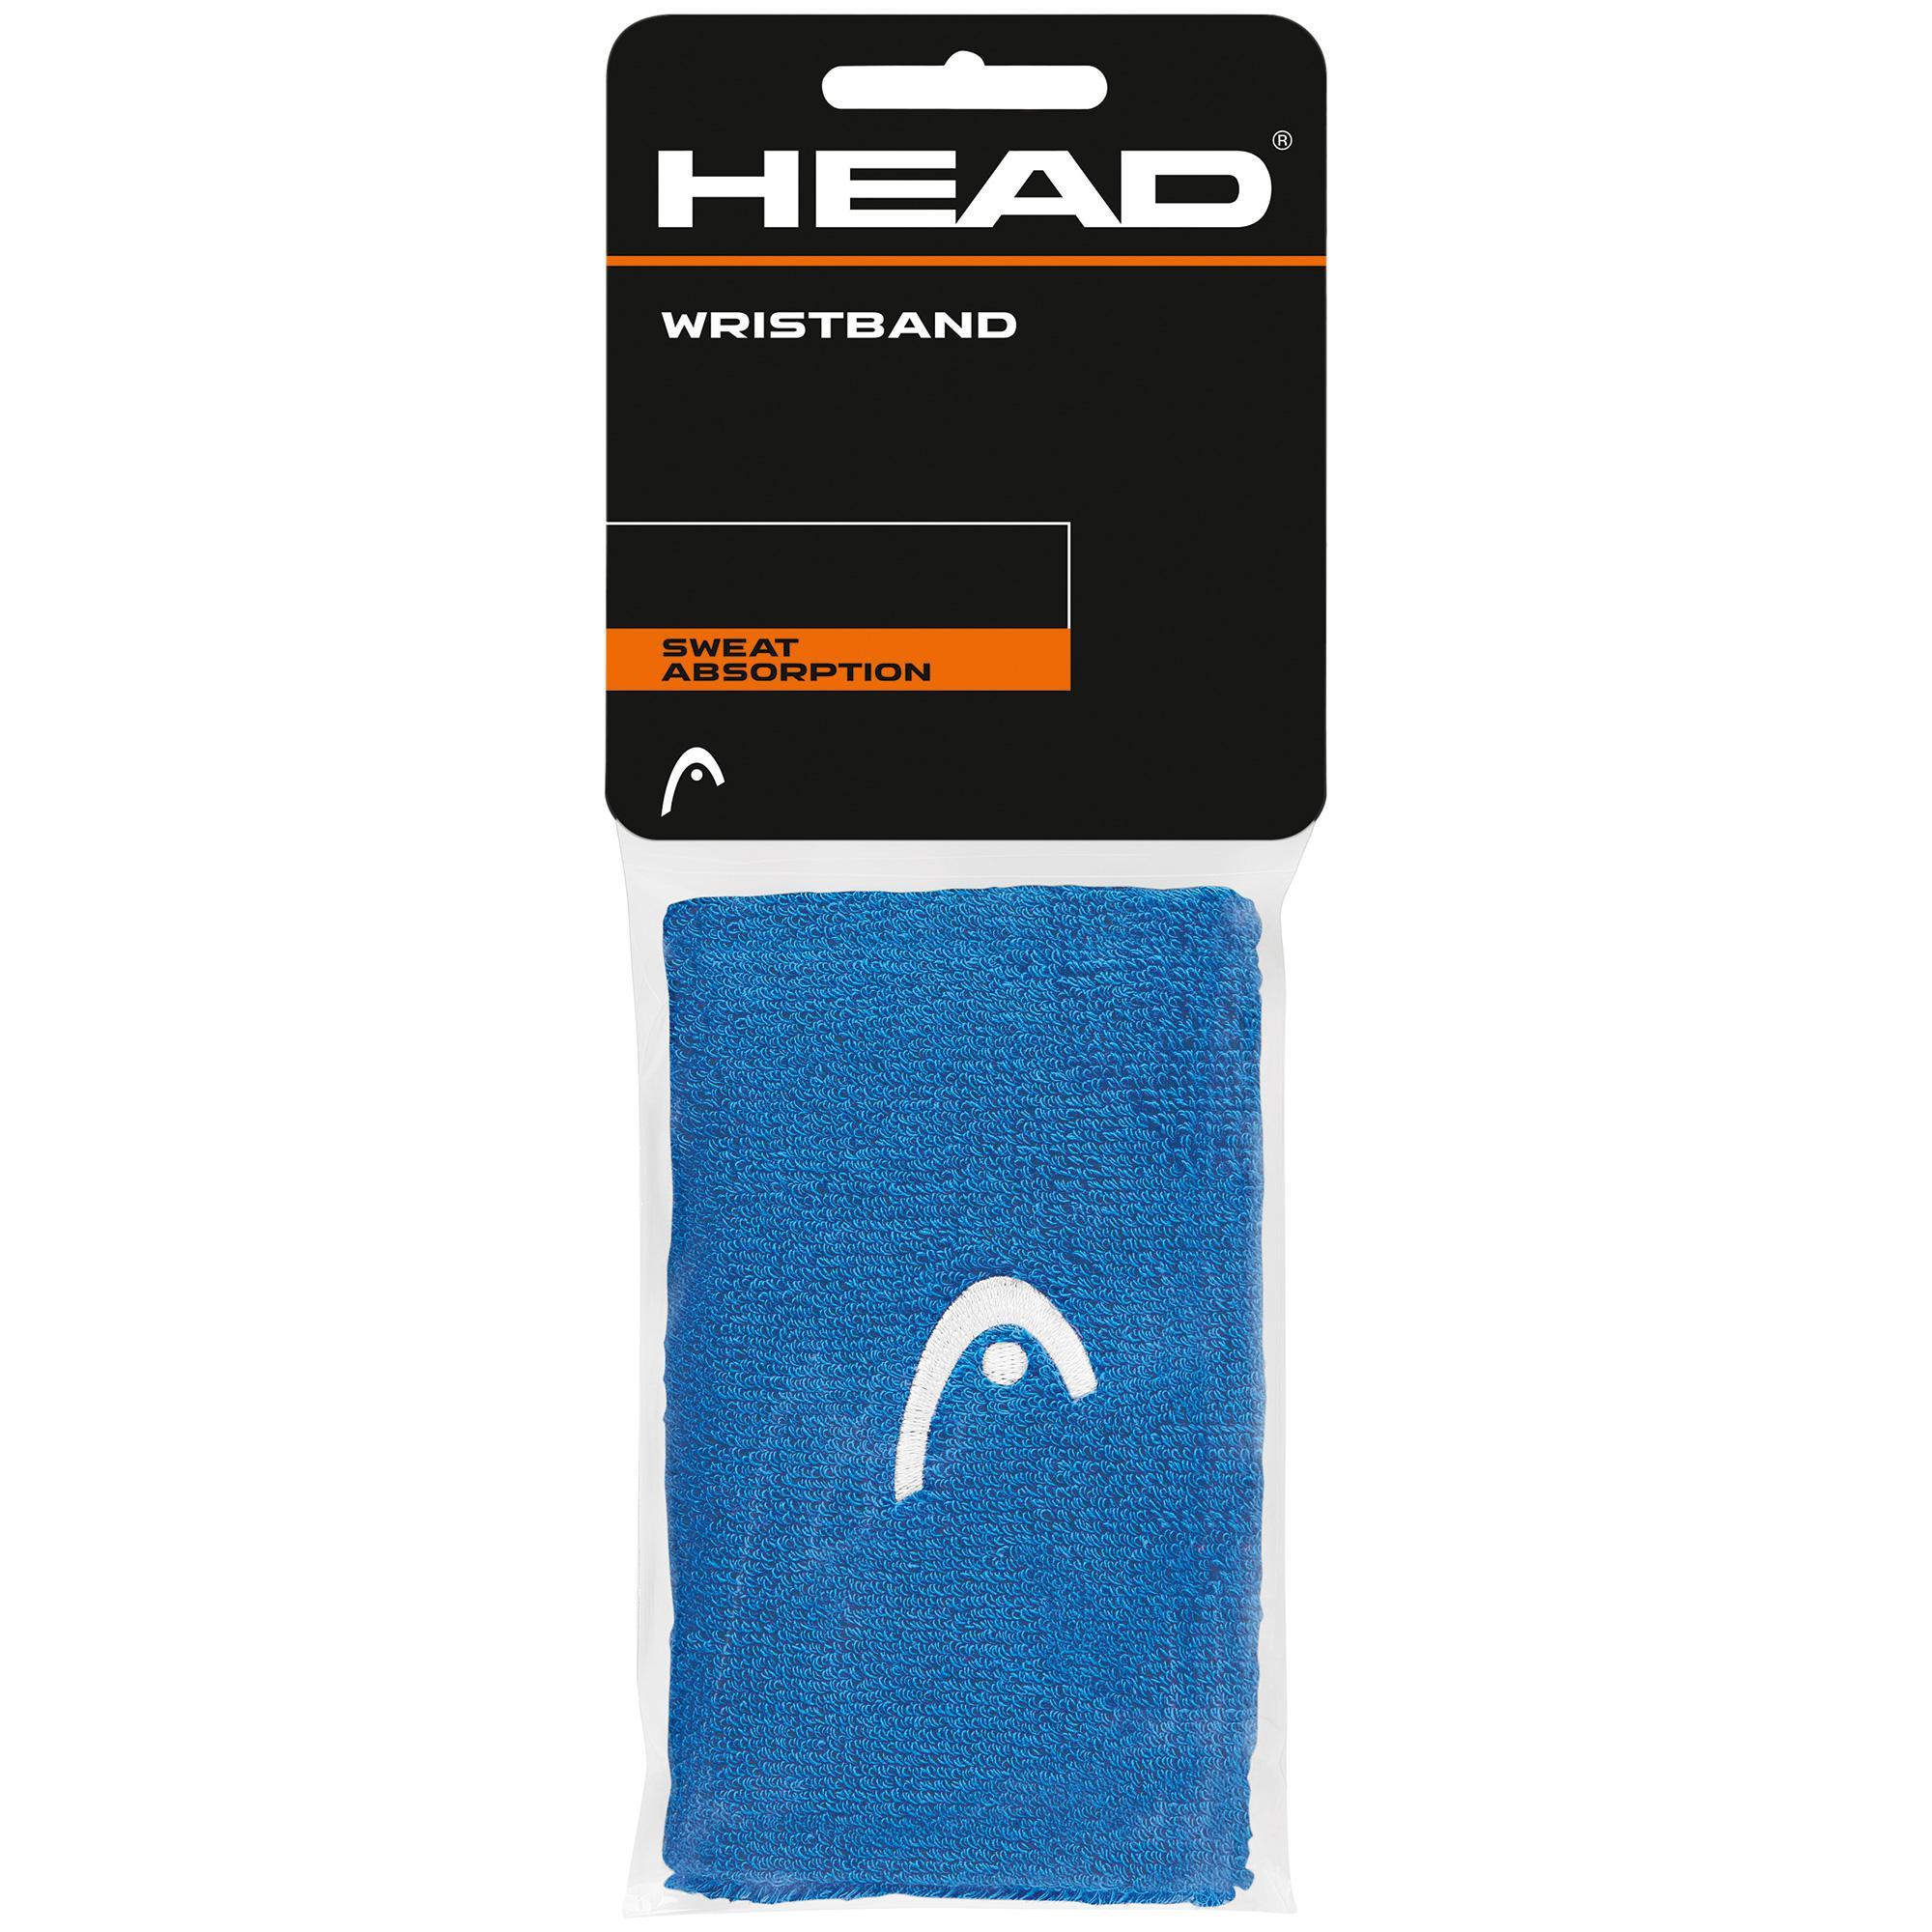 Head Polsini Jumbo Blu 2x (2017)